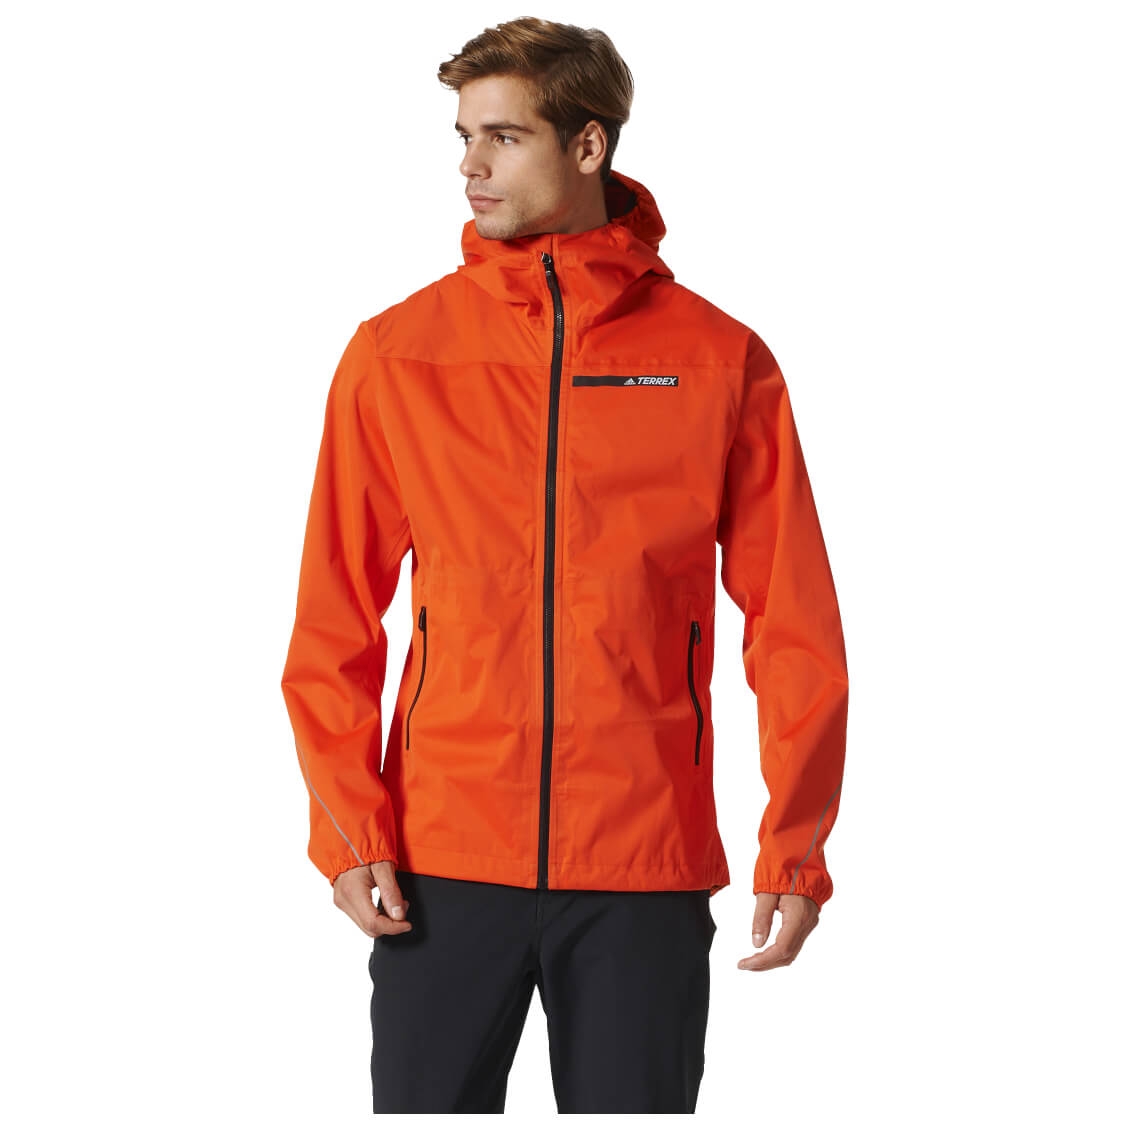 new products arriving new arrivals Adidas Terrex Multi 3L GTX Jacket - Waterproof Jacket Men's ...